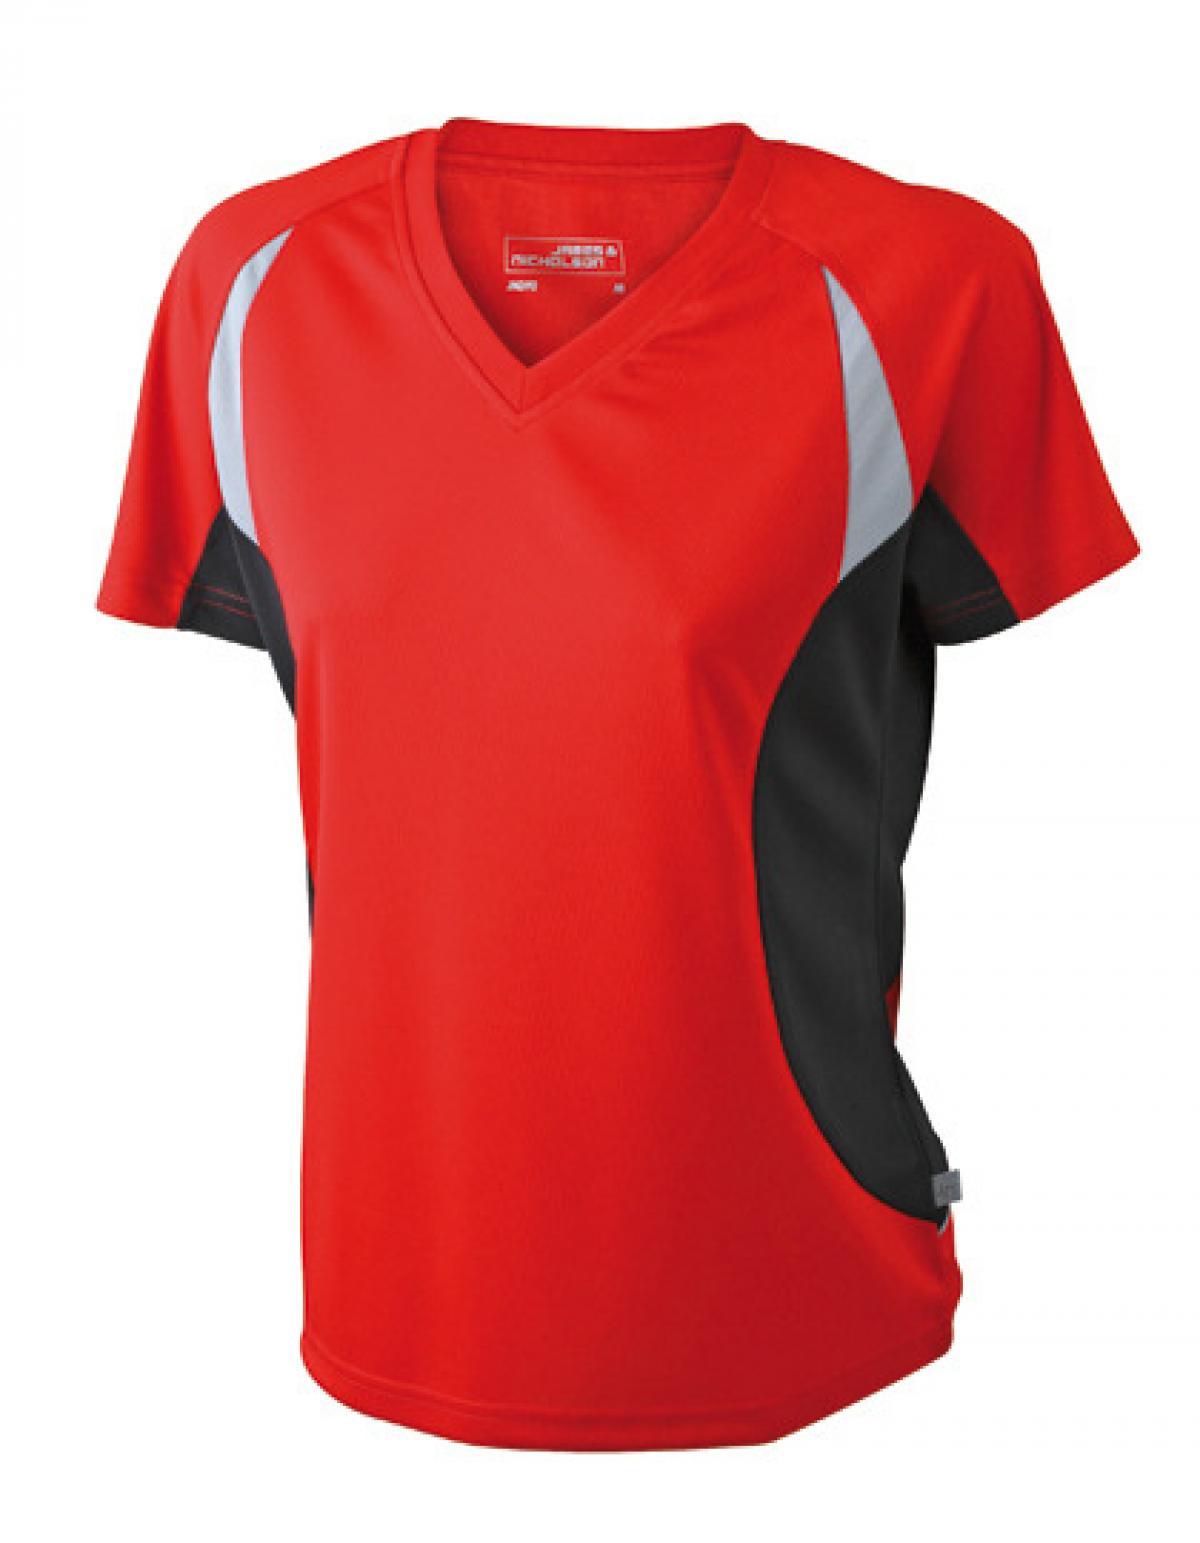 damen running sport t shirt feuchtigkeitsregulierend rexlander s. Black Bedroom Furniture Sets. Home Design Ideas